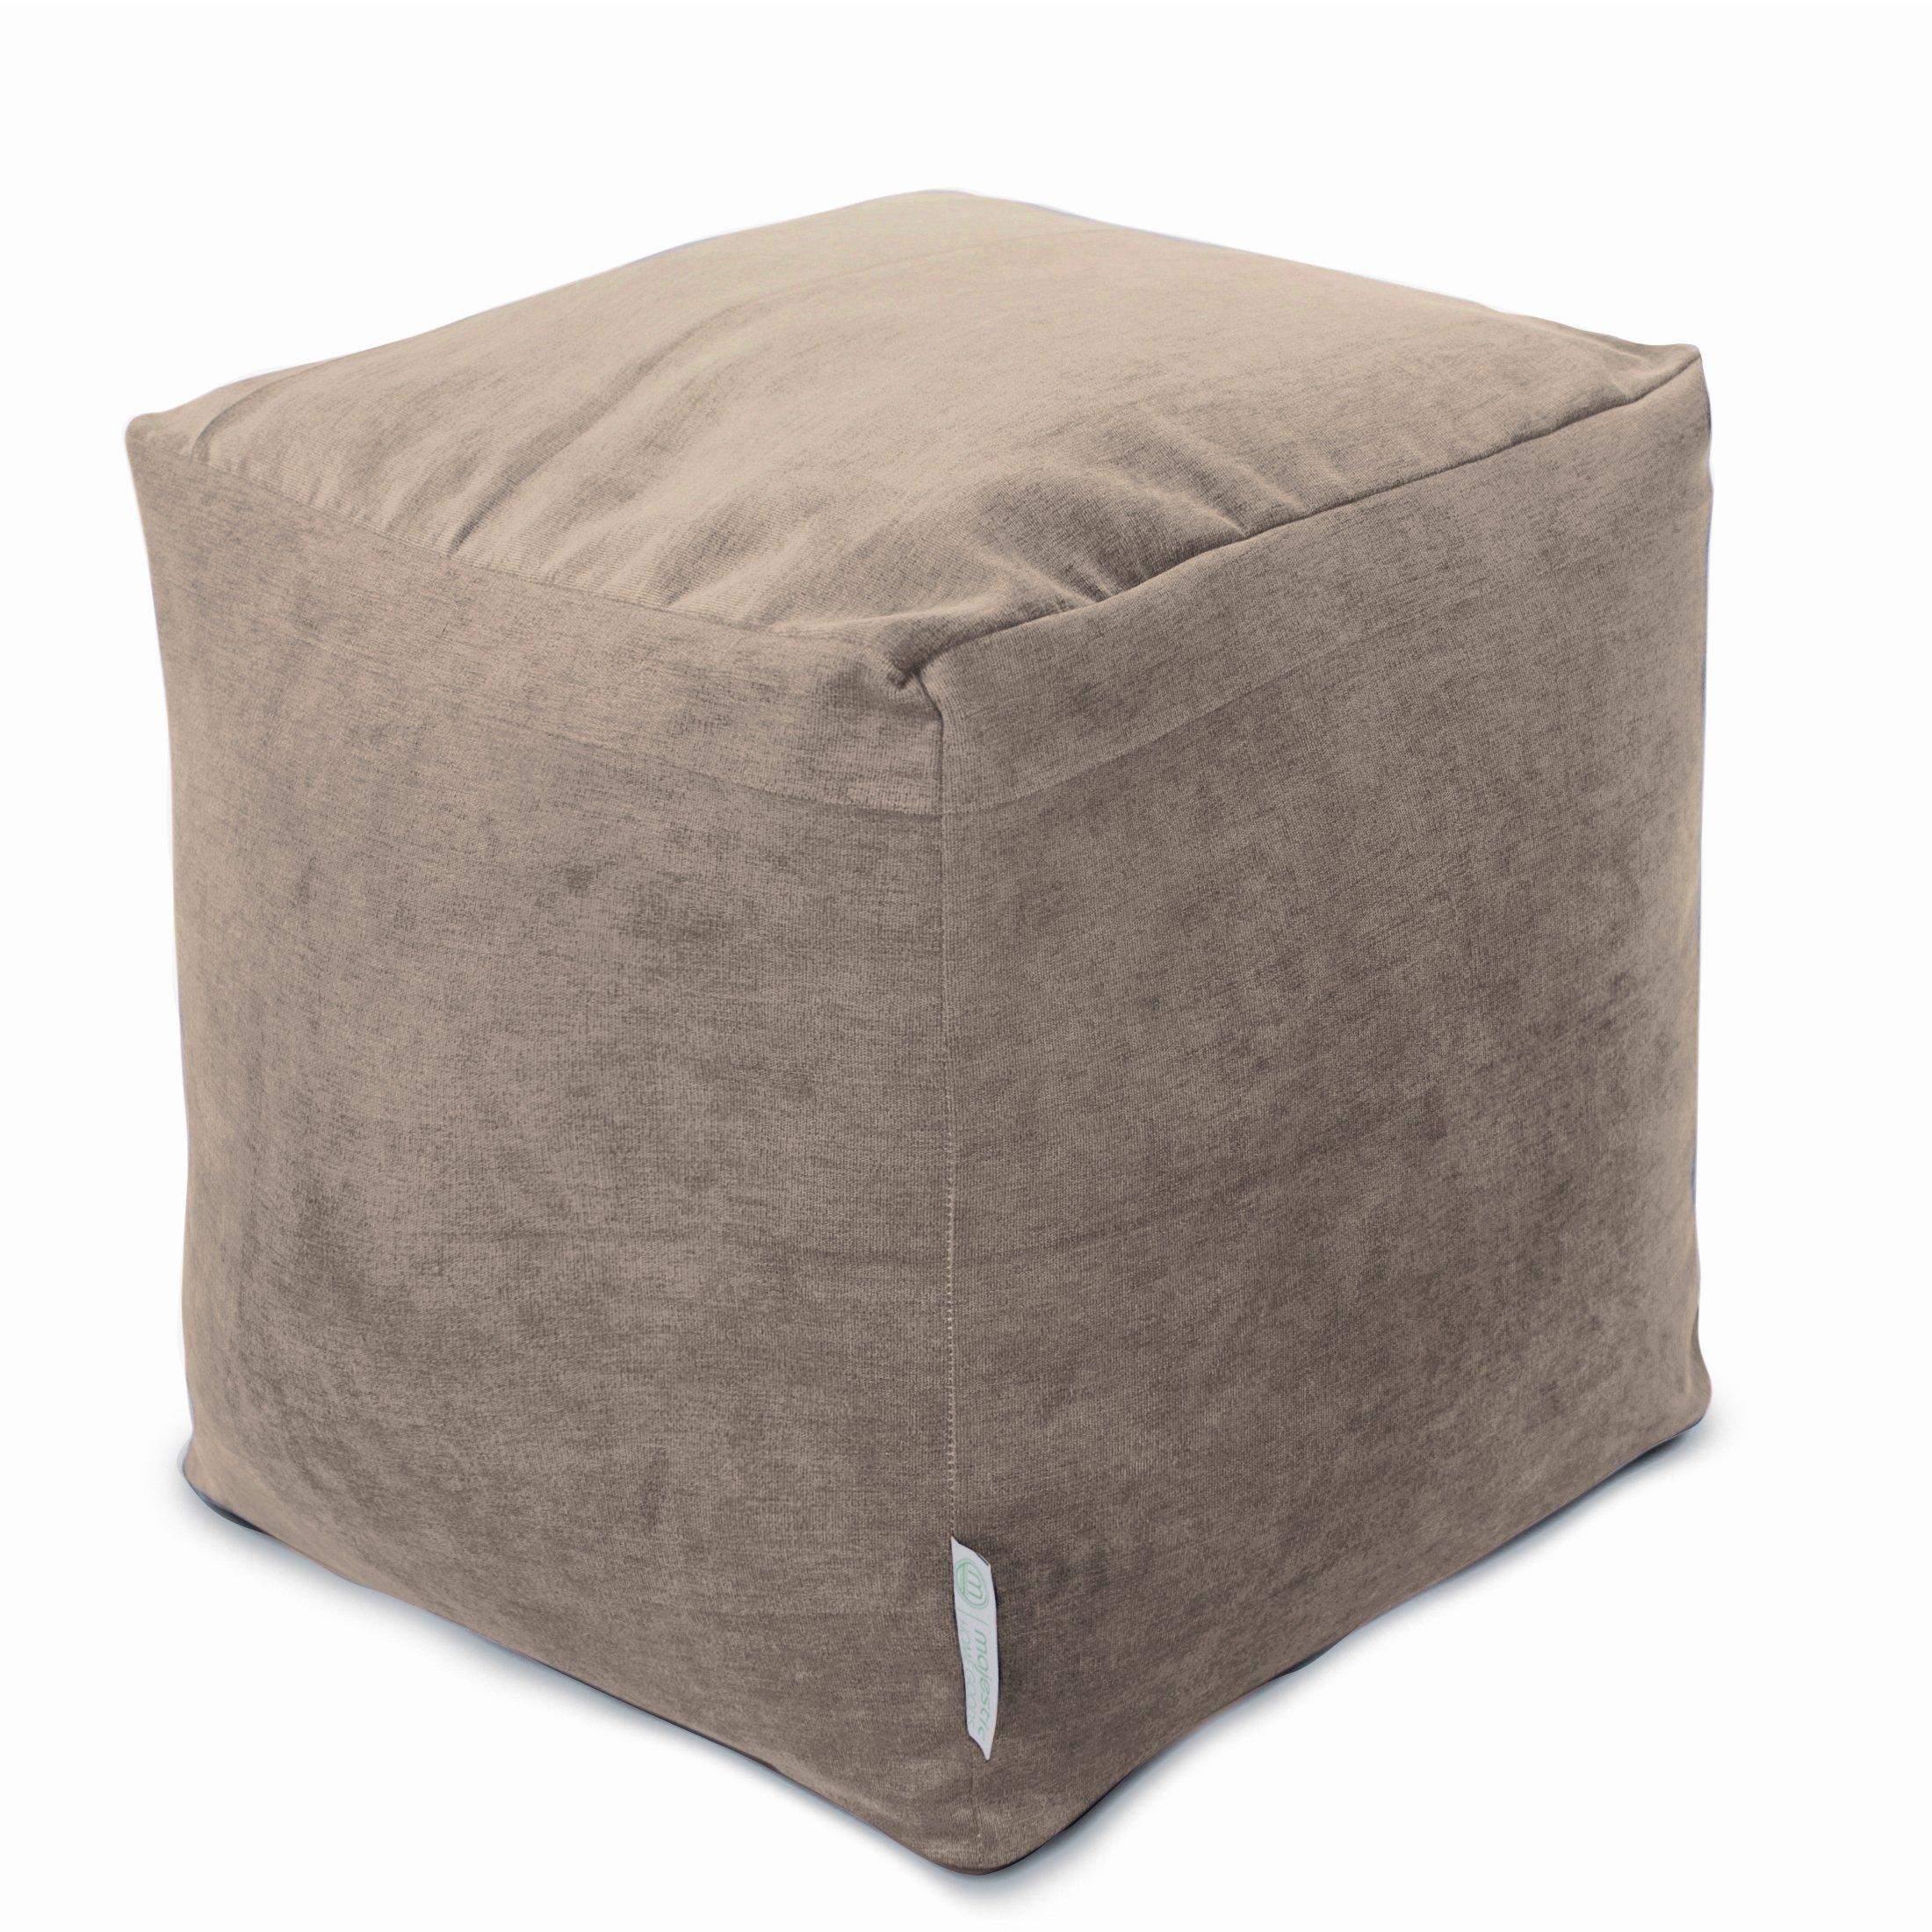 Majestic Home Goods Pearl Villa Indoor Bean Bag Ottoman Pouf Cube 17'' L x 17'' W x 17'' H